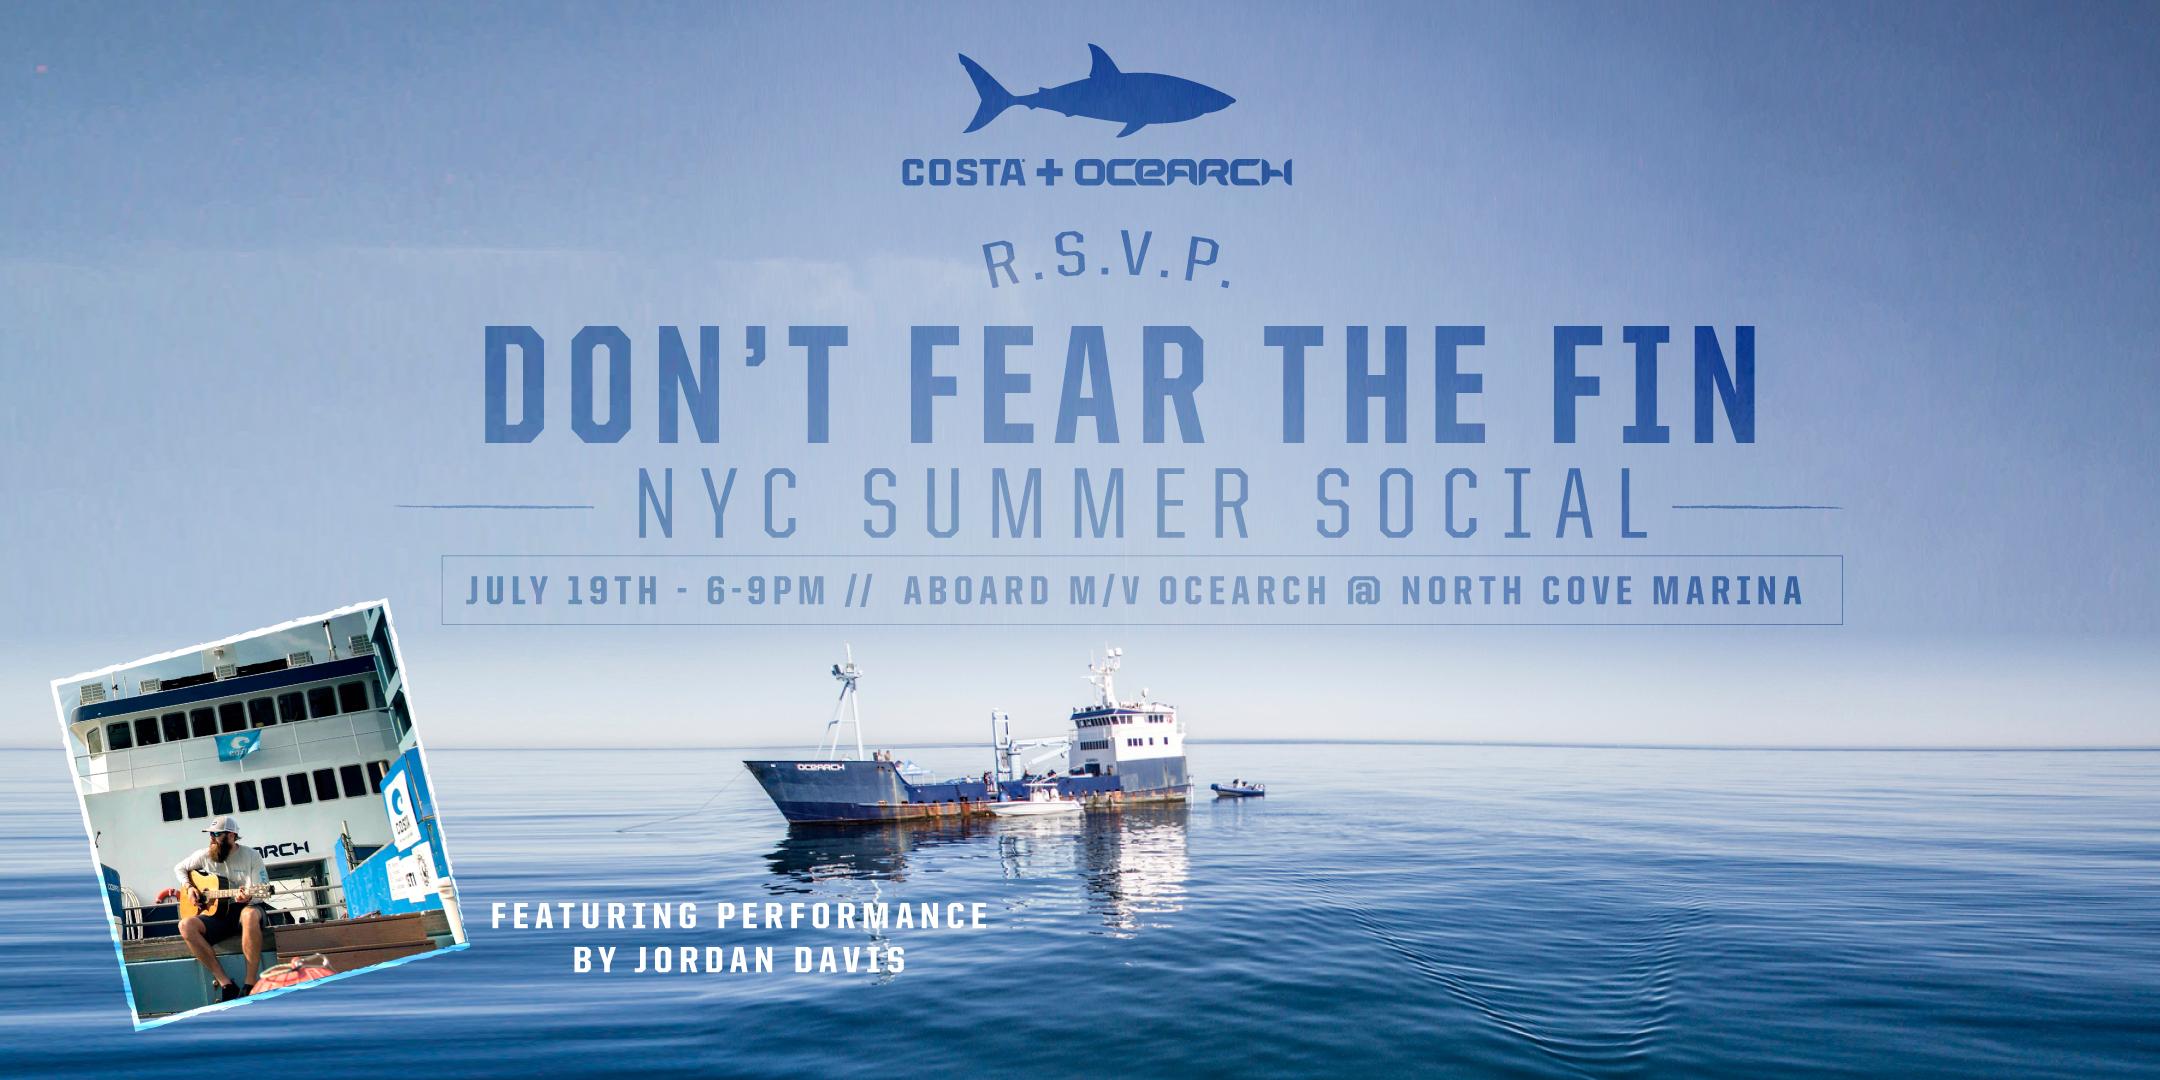 Costa_eventbrite_summer_social_RSVP.jpg